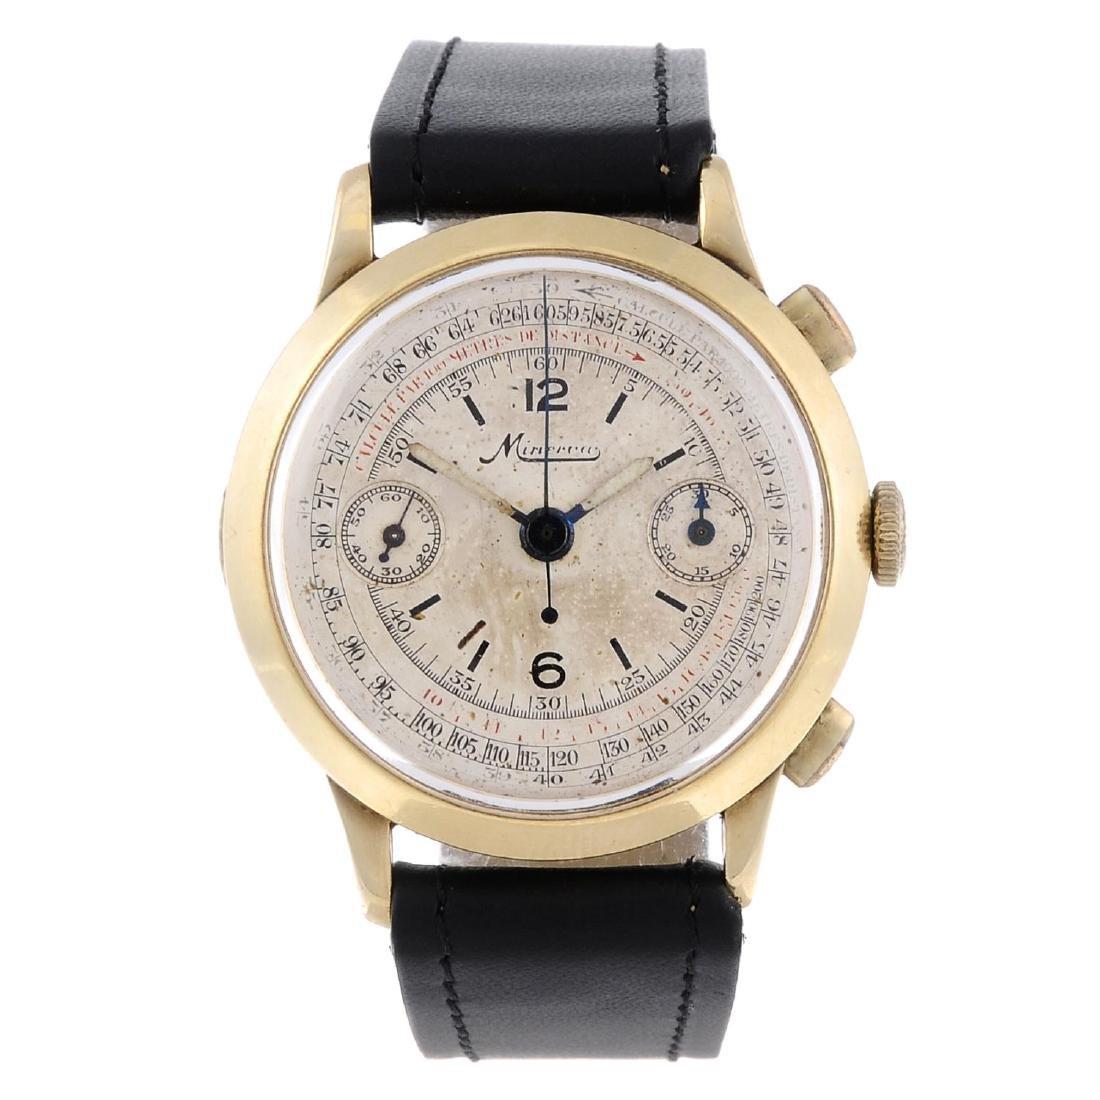 MINERVA - a gentleman's chronograph wrist watch. Yellow